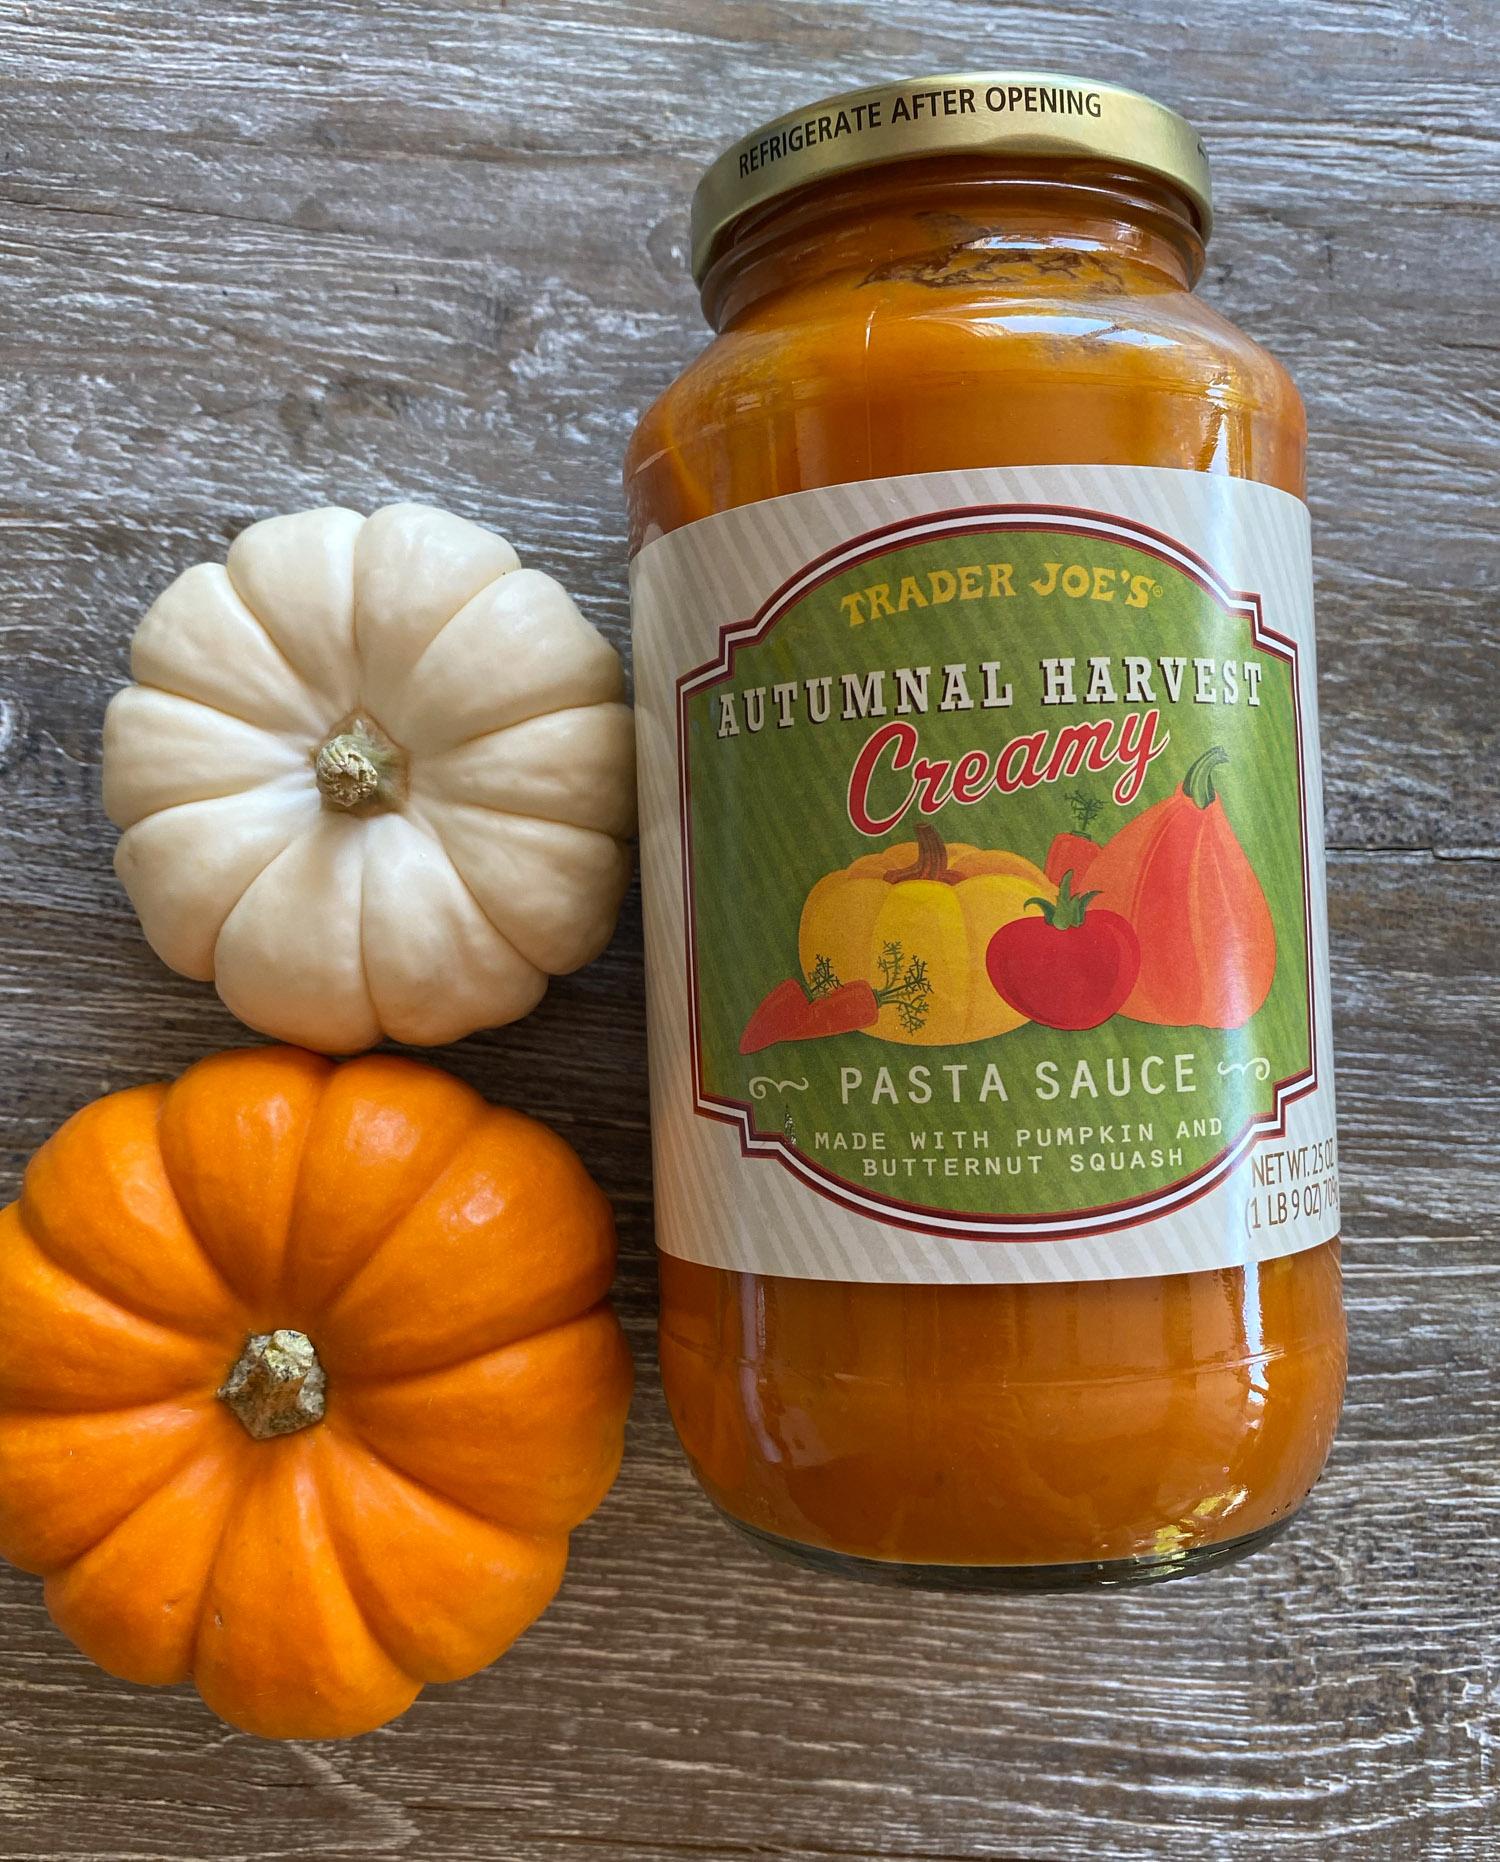 Trader Joe's pumpkin pasta sauce